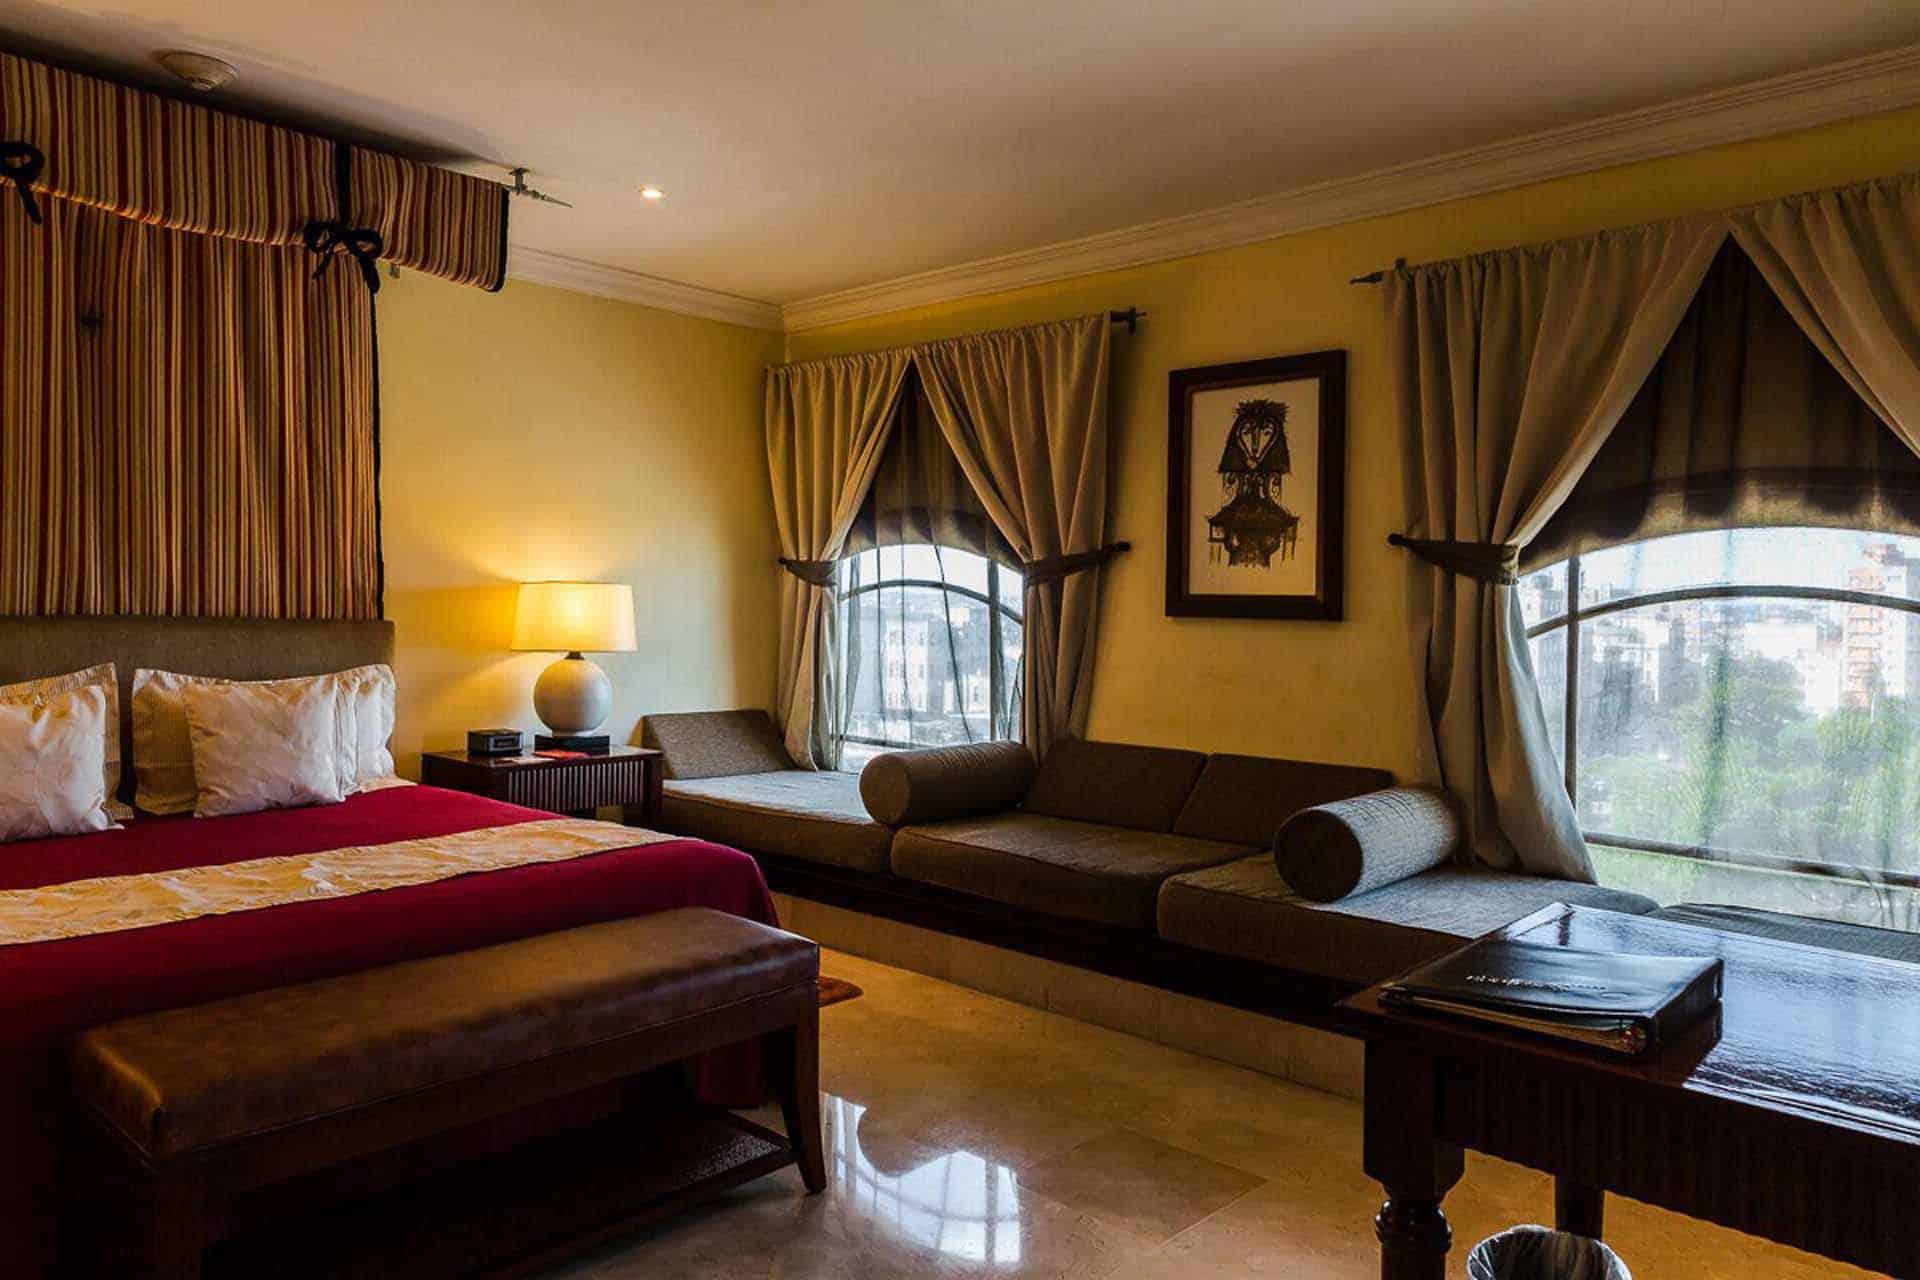 H2483 Hotel Saratoga 06 cuba autrement